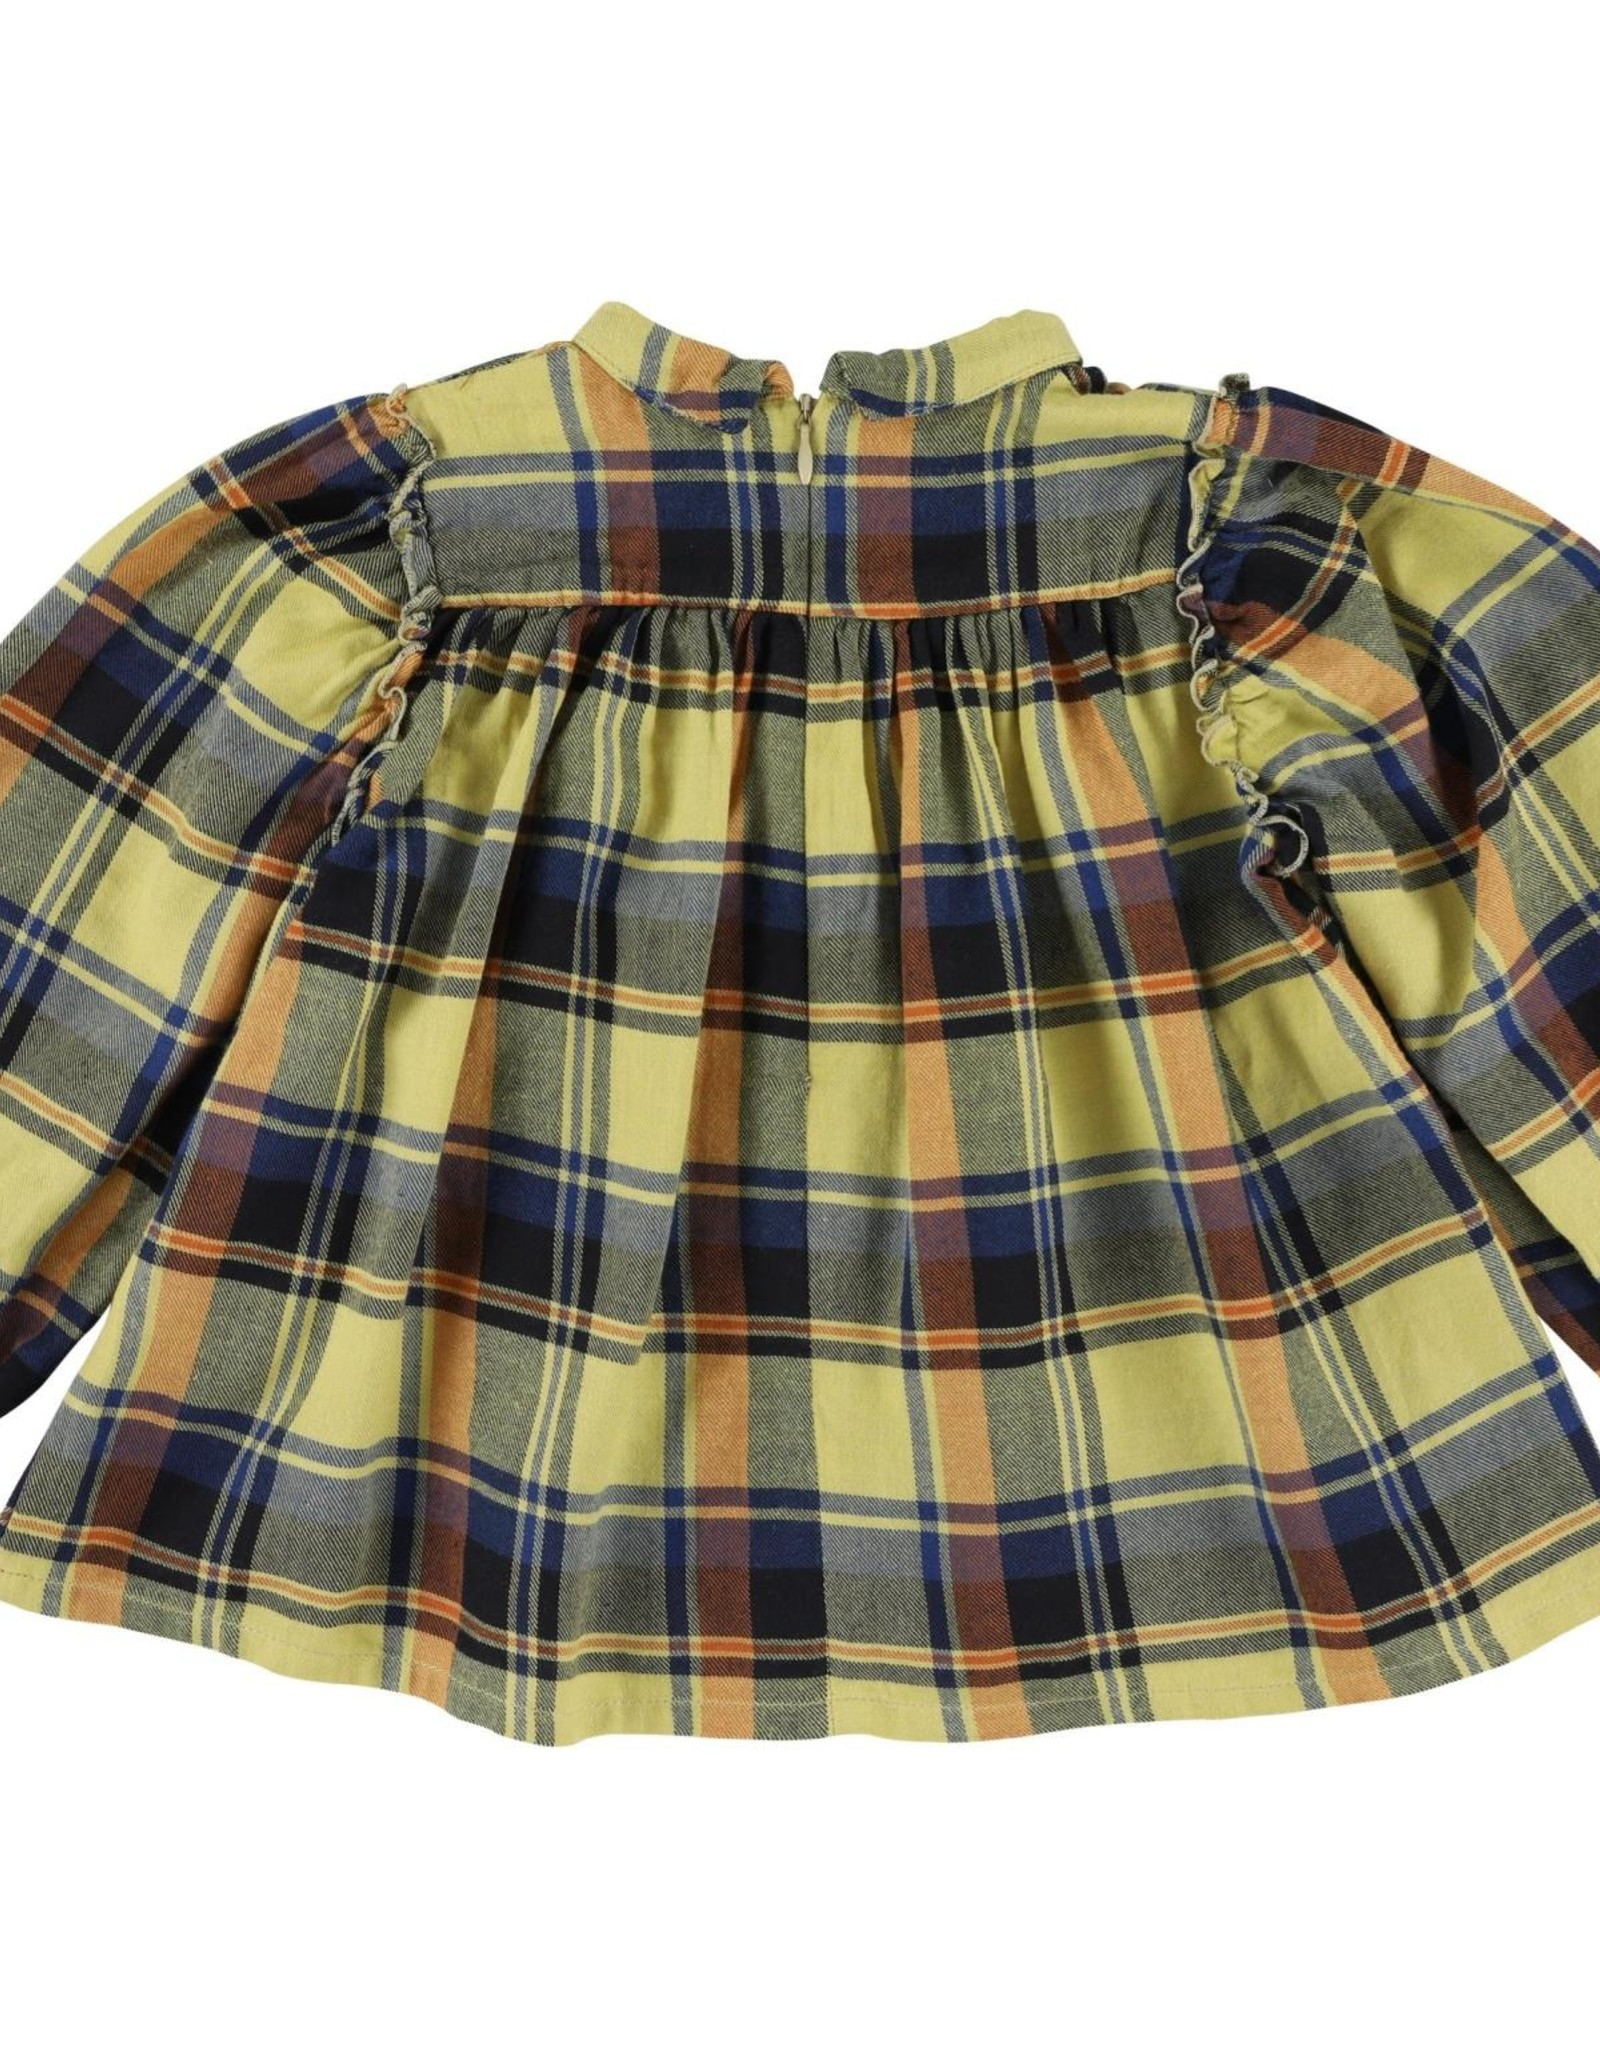 MORLEY Martha Akan Bamboo Girlsshirt